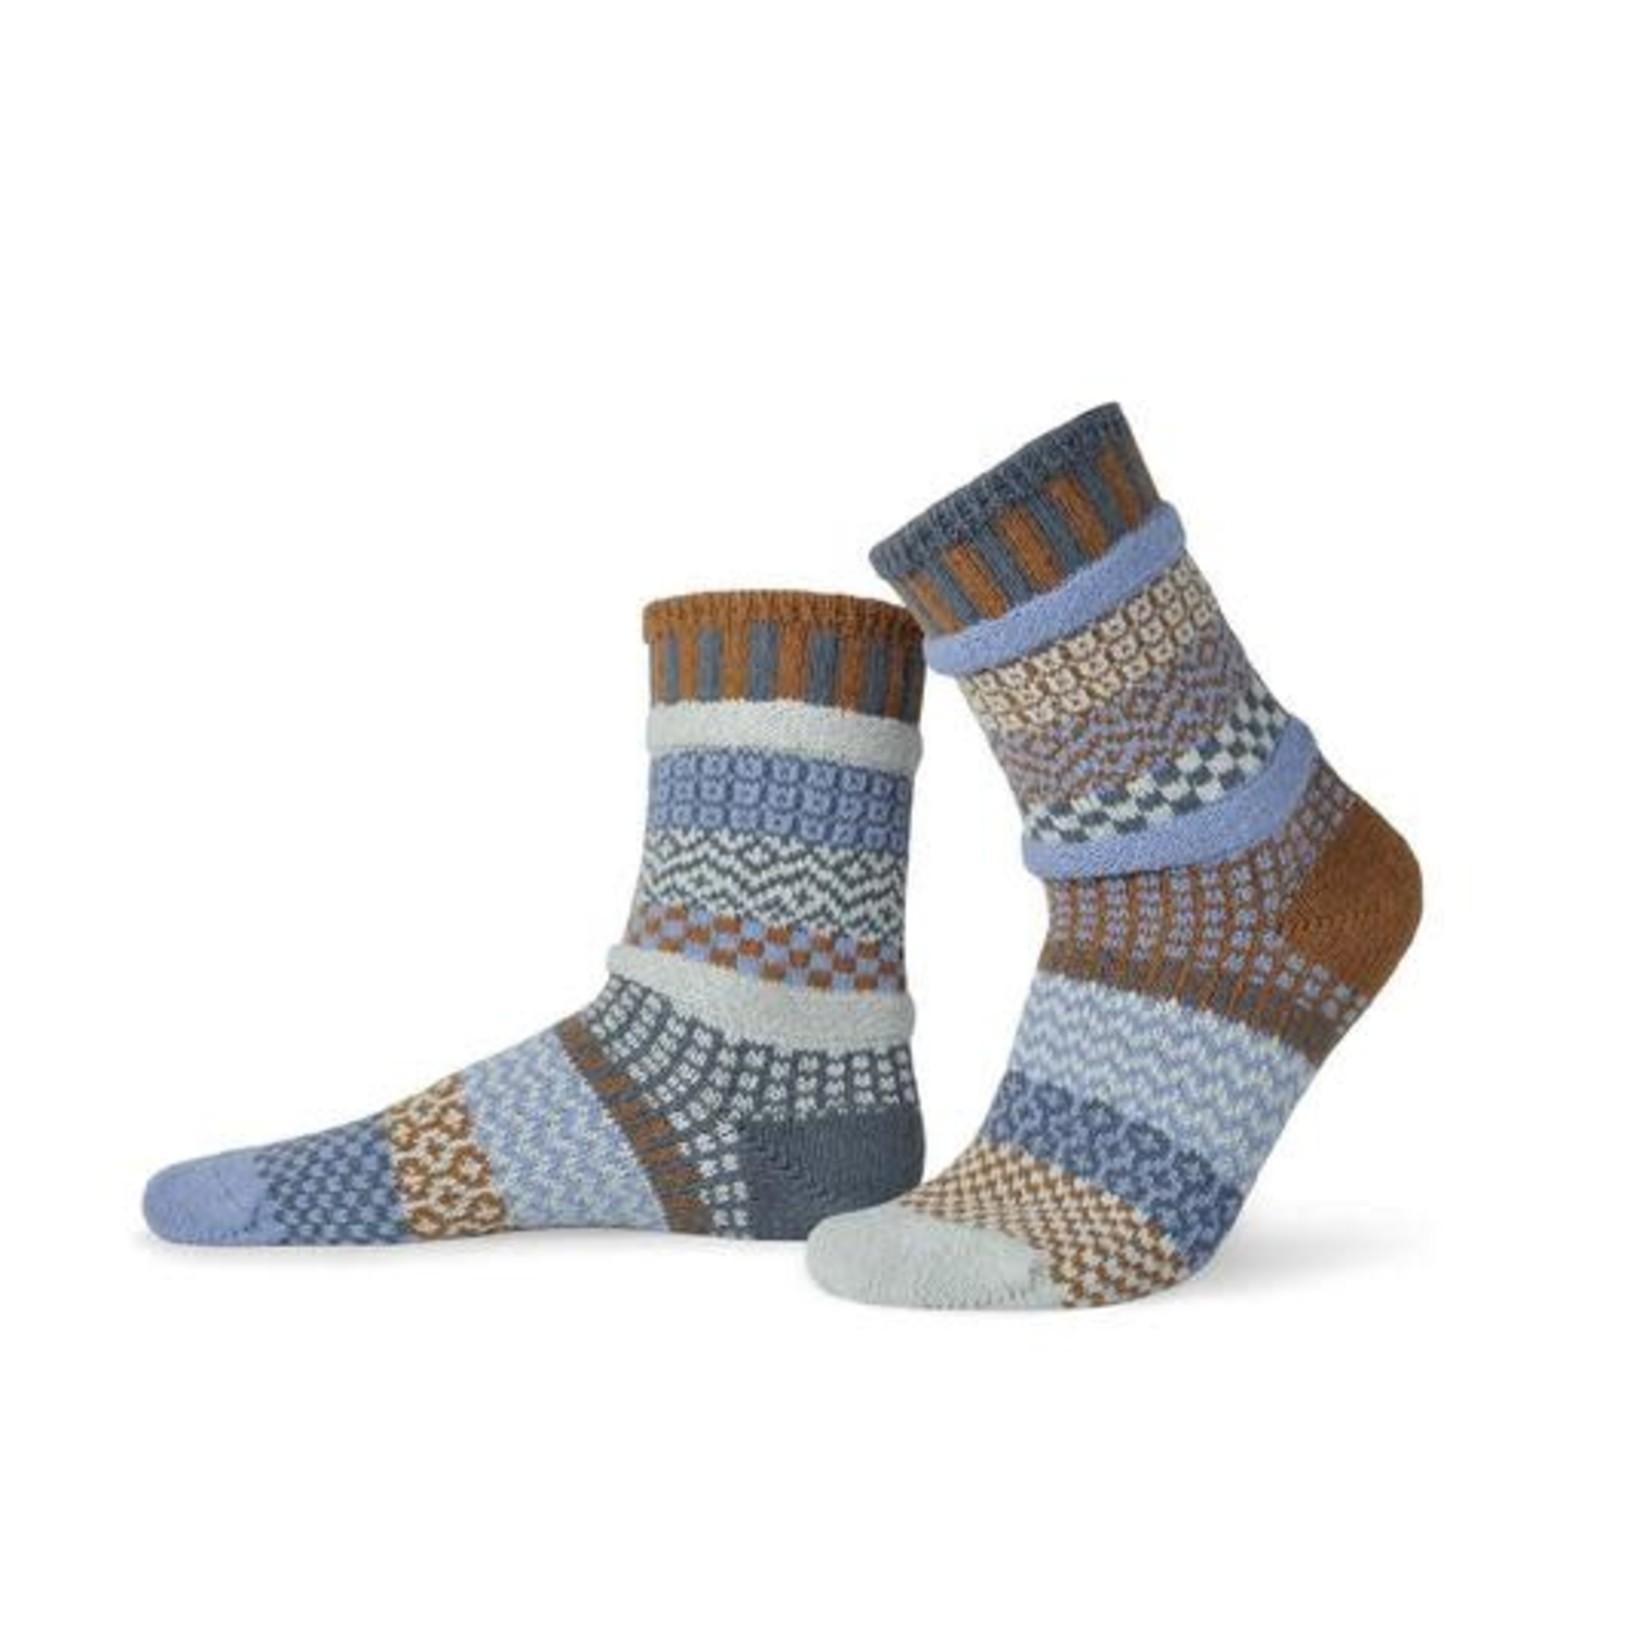 Solmates Aloe Crew Socks